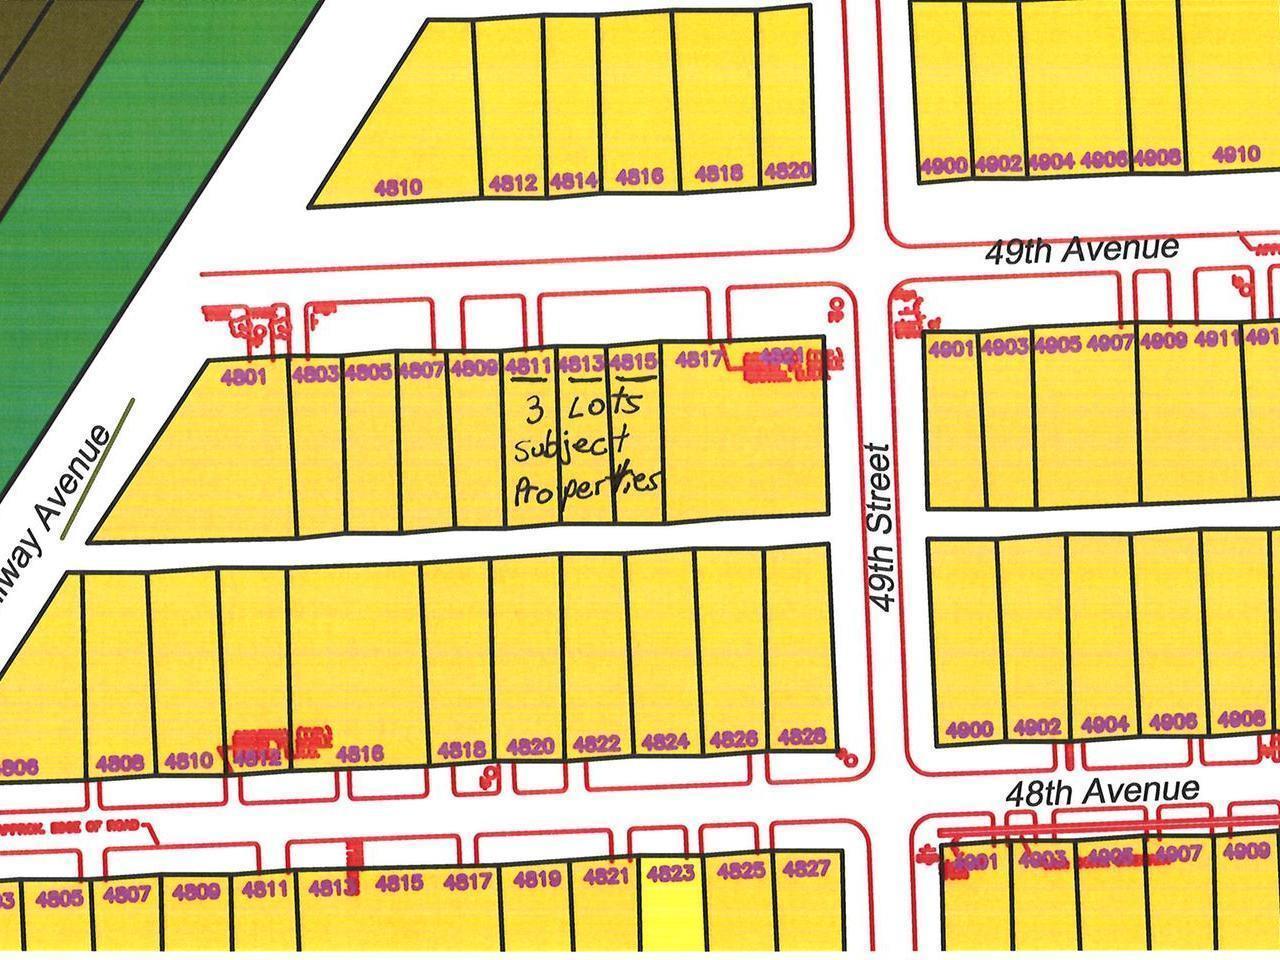 4811 49 Avenue,, Pouce Coupe, British Columbia  V0C 2C0 - Photo 3 - 169571